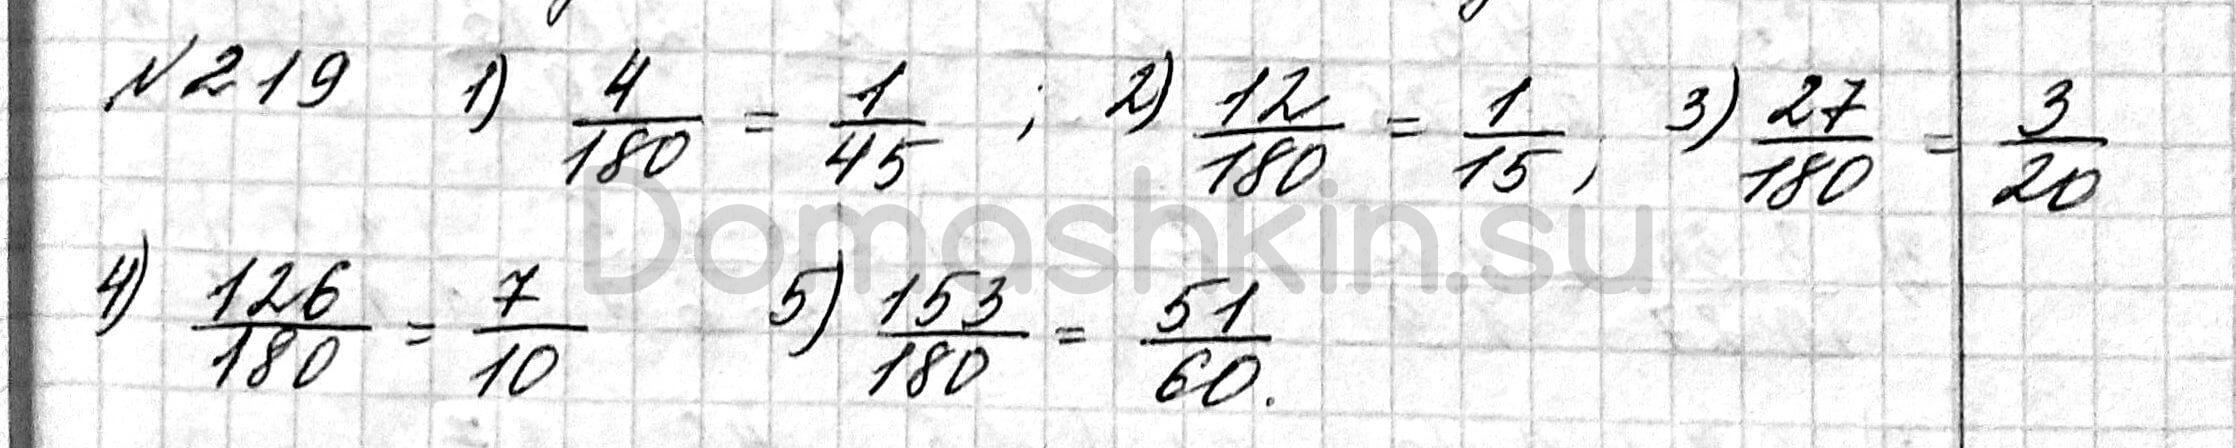 Математика 6 класс учебник Мерзляк номер 219 решение